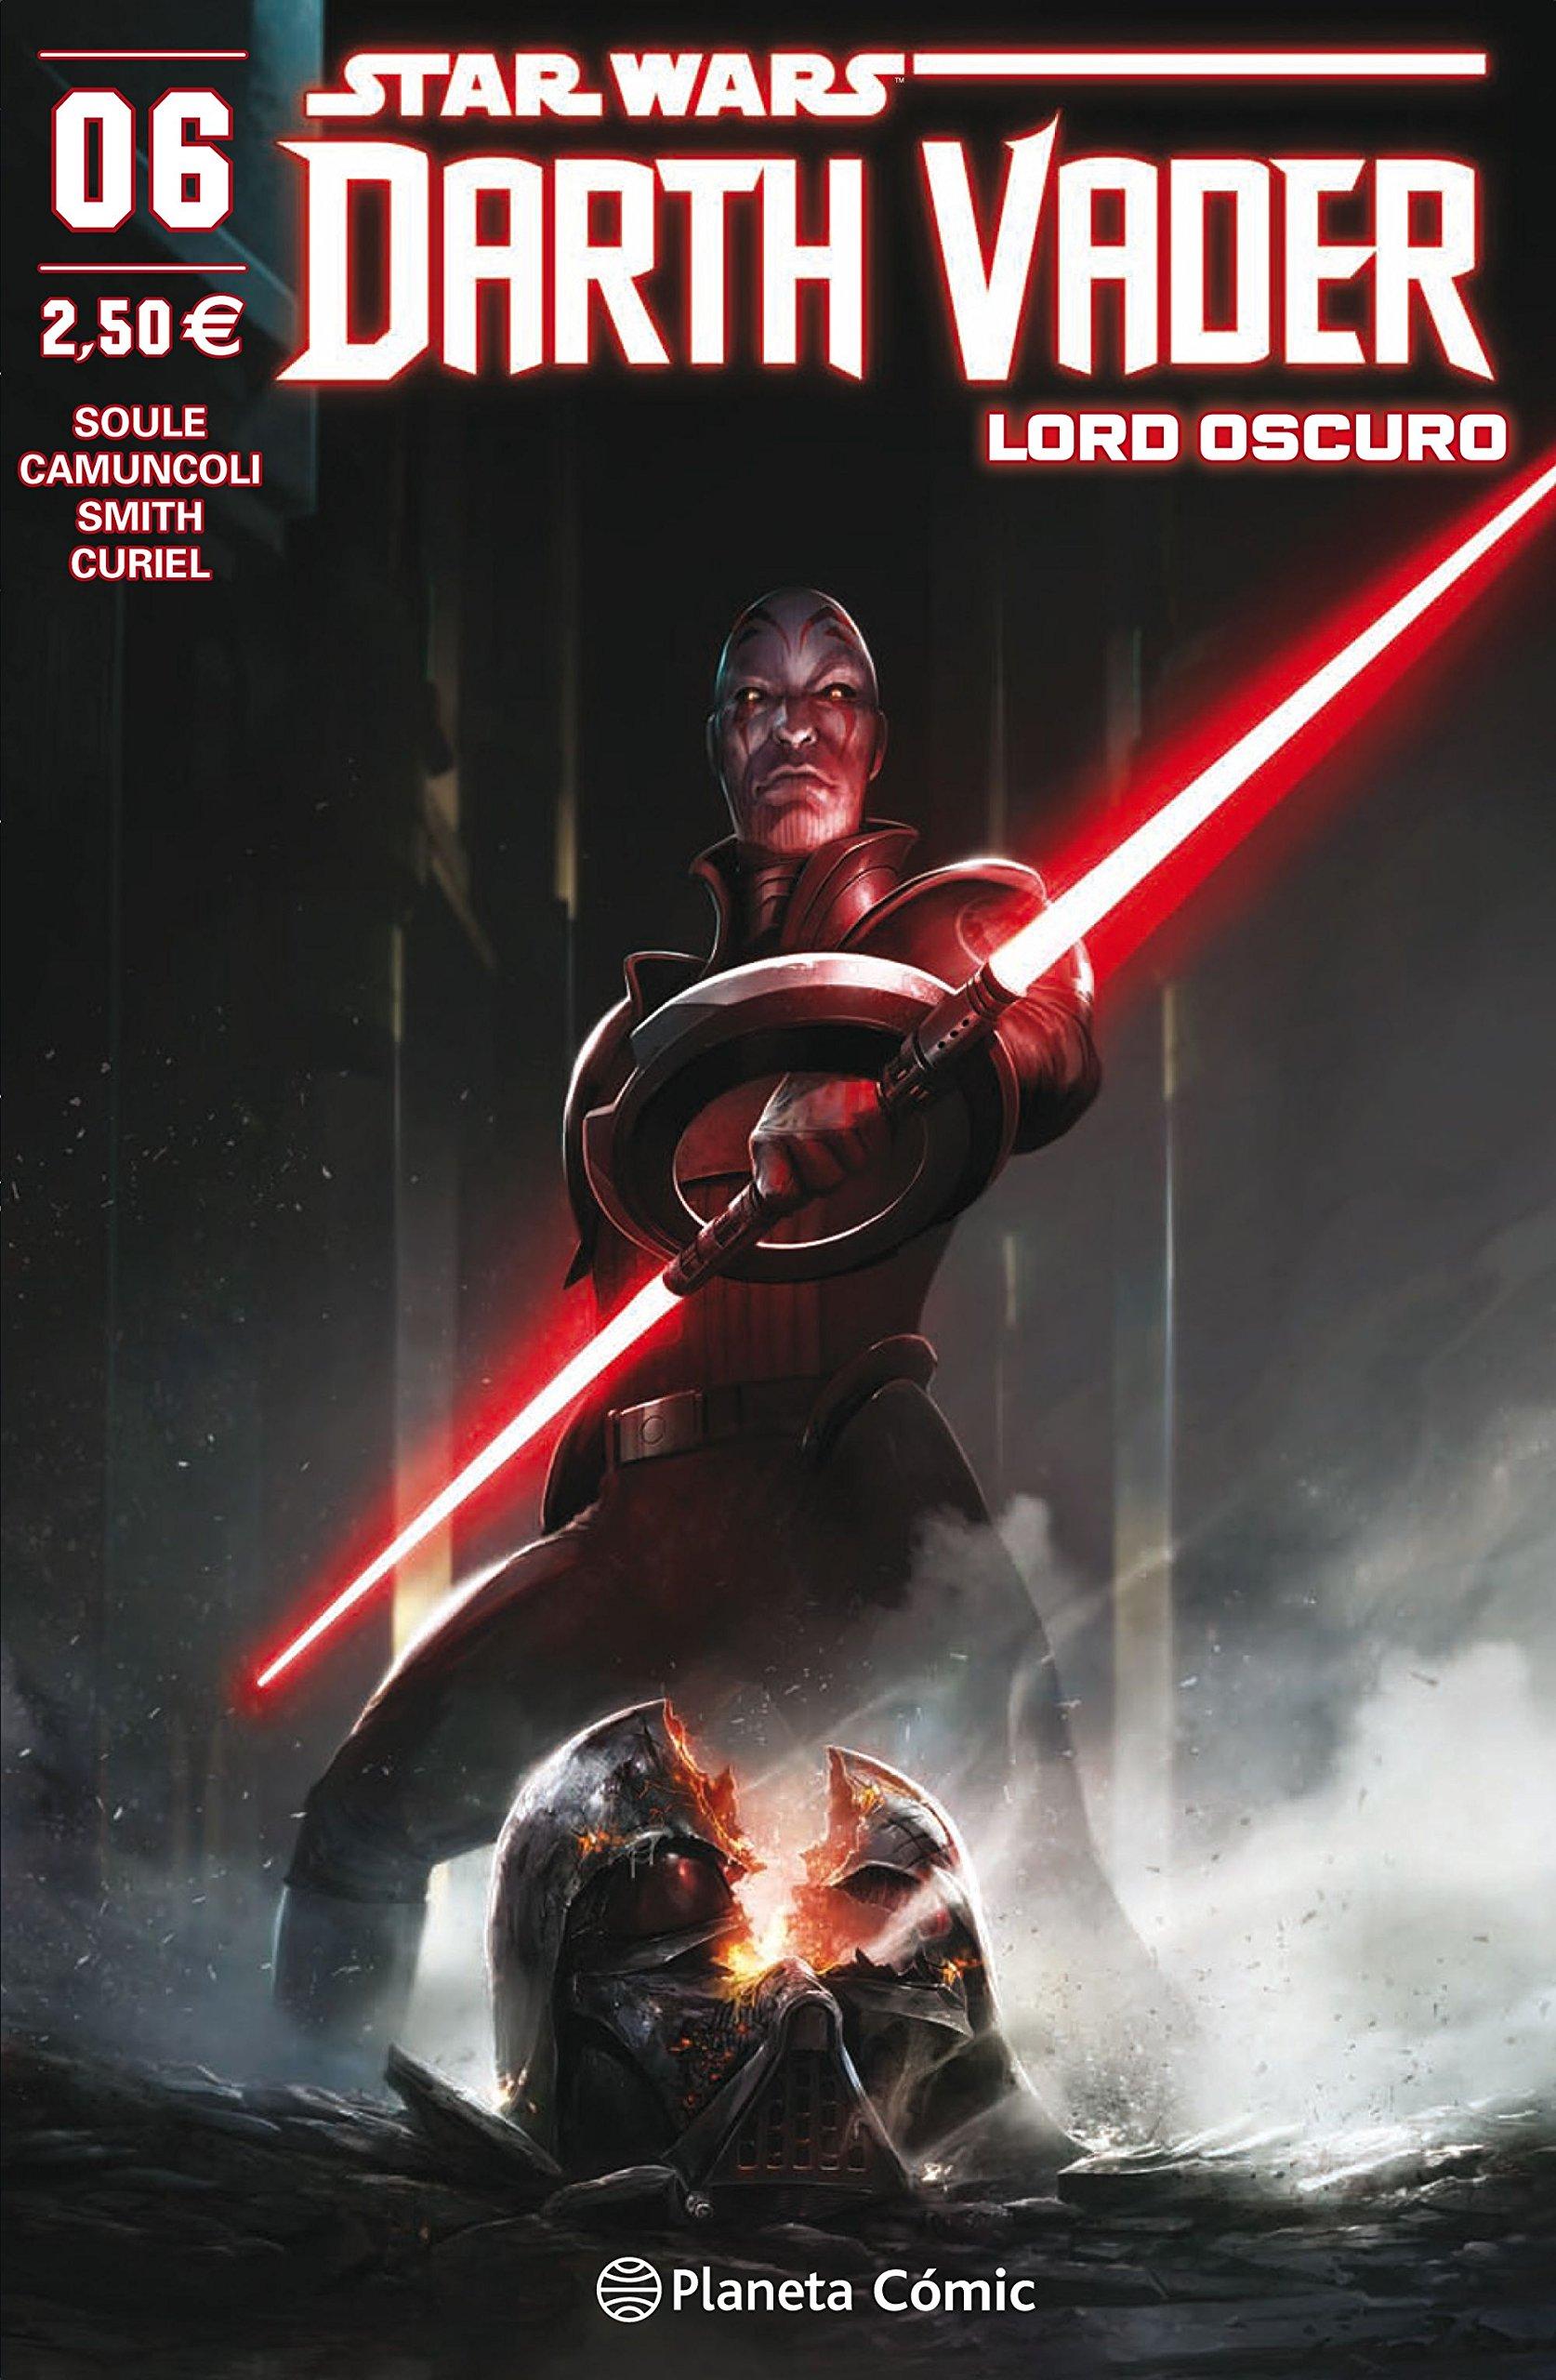 Star Wars Darth Vader Lord Oscuro nº 06 (Star Wars: Cómics Grapa Marvel) Tapa blanda – 2 oct 2018 Charles Soule Giuseppe Camuncoli Planeta DeAgostini Cómics 8491469060